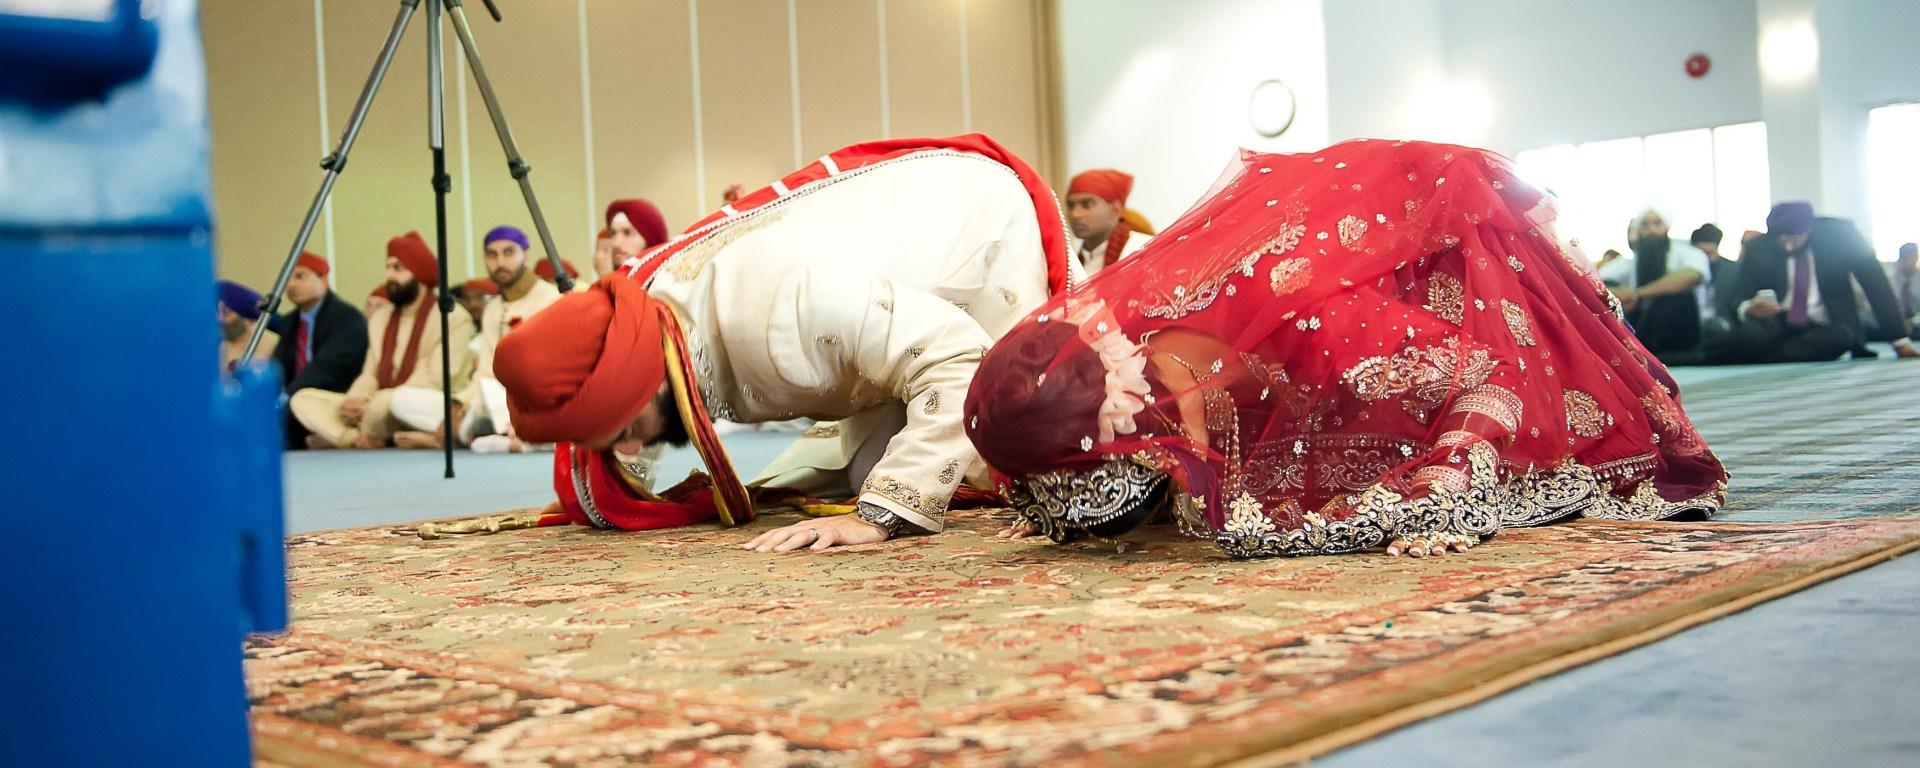 Anand Karaj Sikh ceremony Indian wedding at the Gurdwara